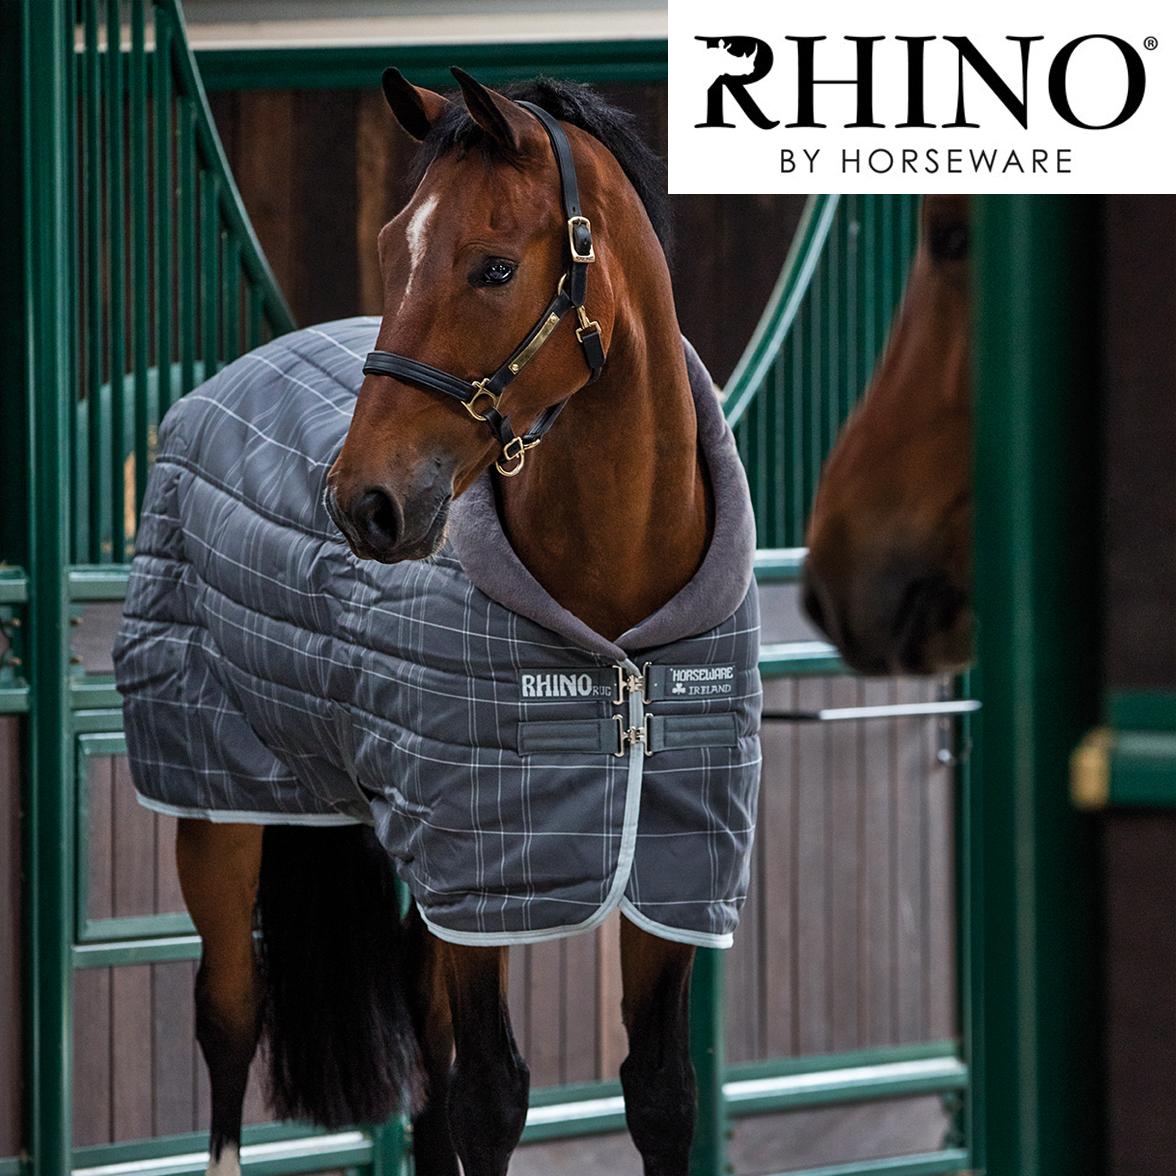 Horseware Rhino Original Heavy Stable Rug C with Vari-Layer (Charcoal/Grau/Weiß C Rug a20cf3